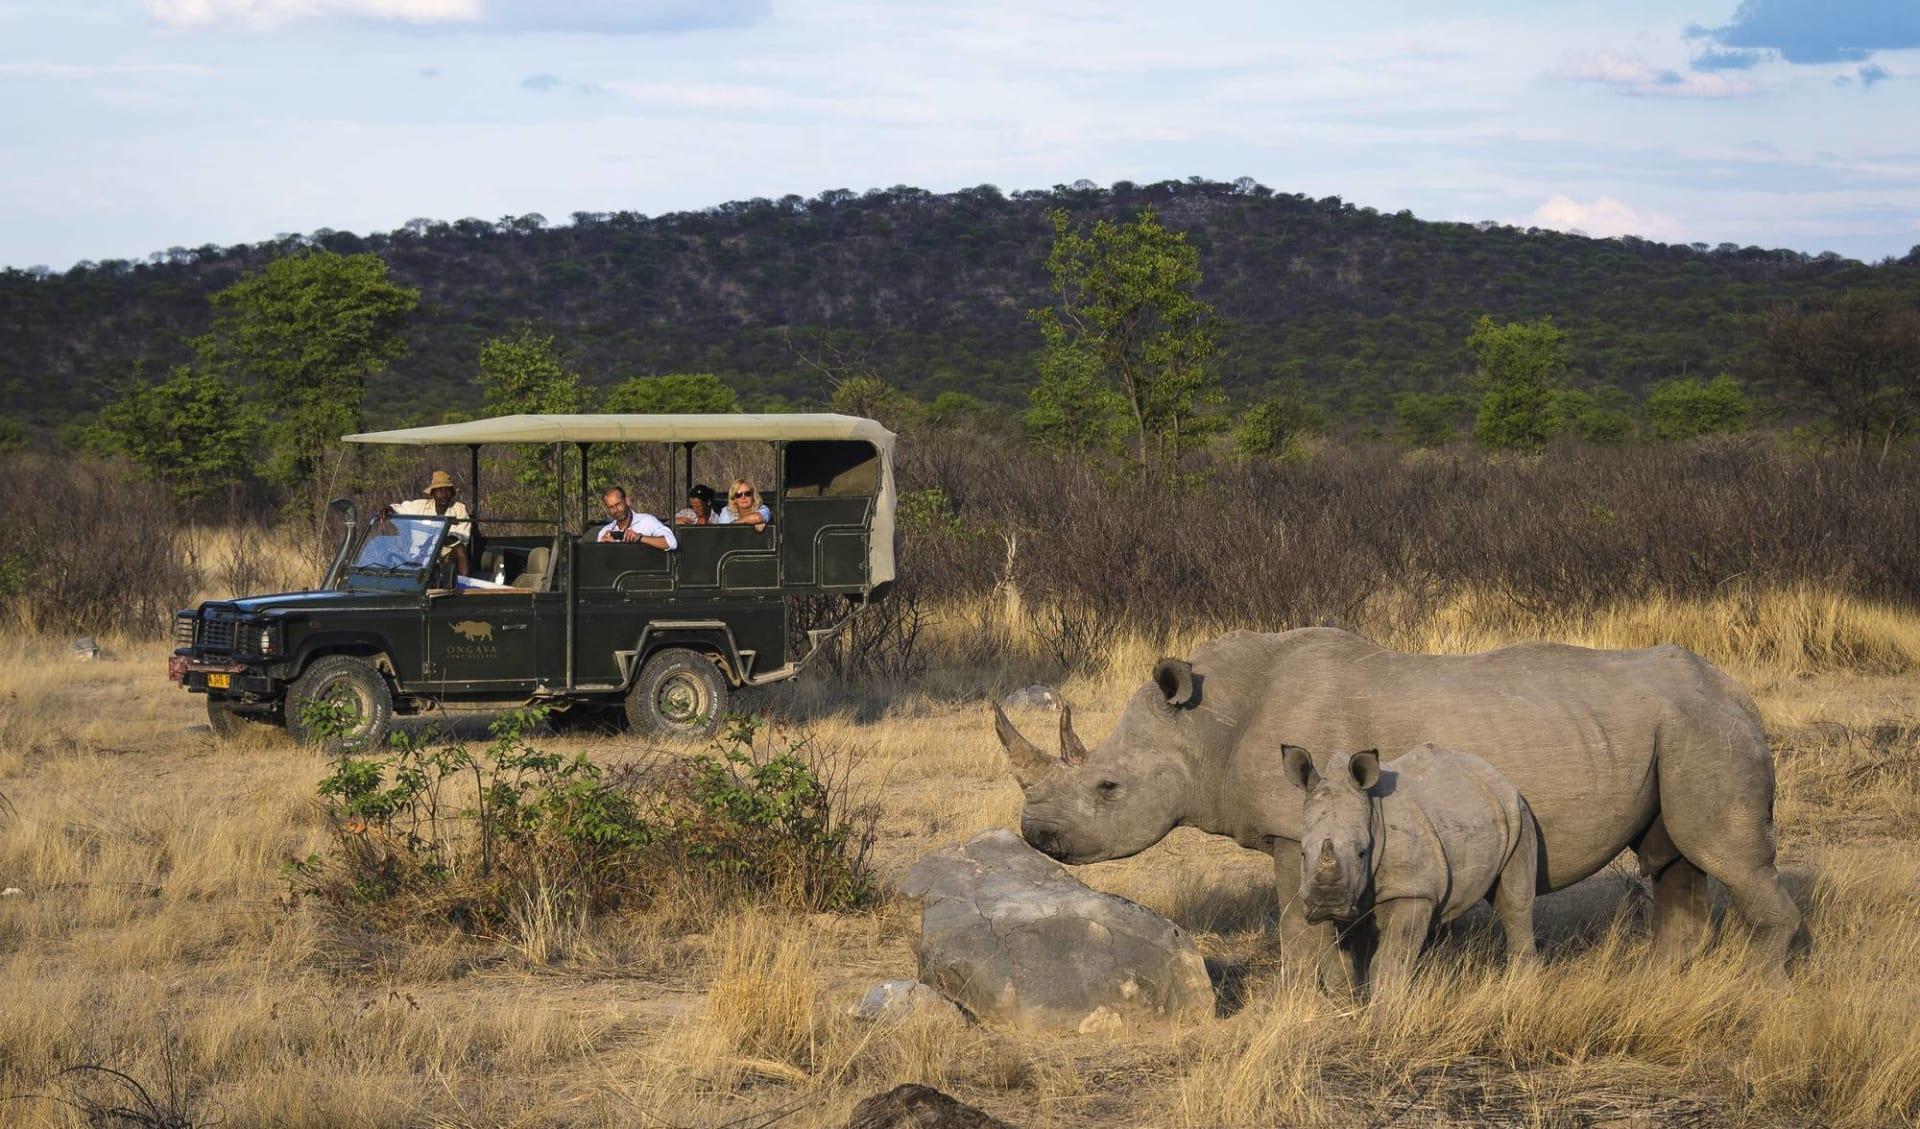 Abenteuer Safari ab Johannesburg: activities: Safarifahrzeug und Nashörner